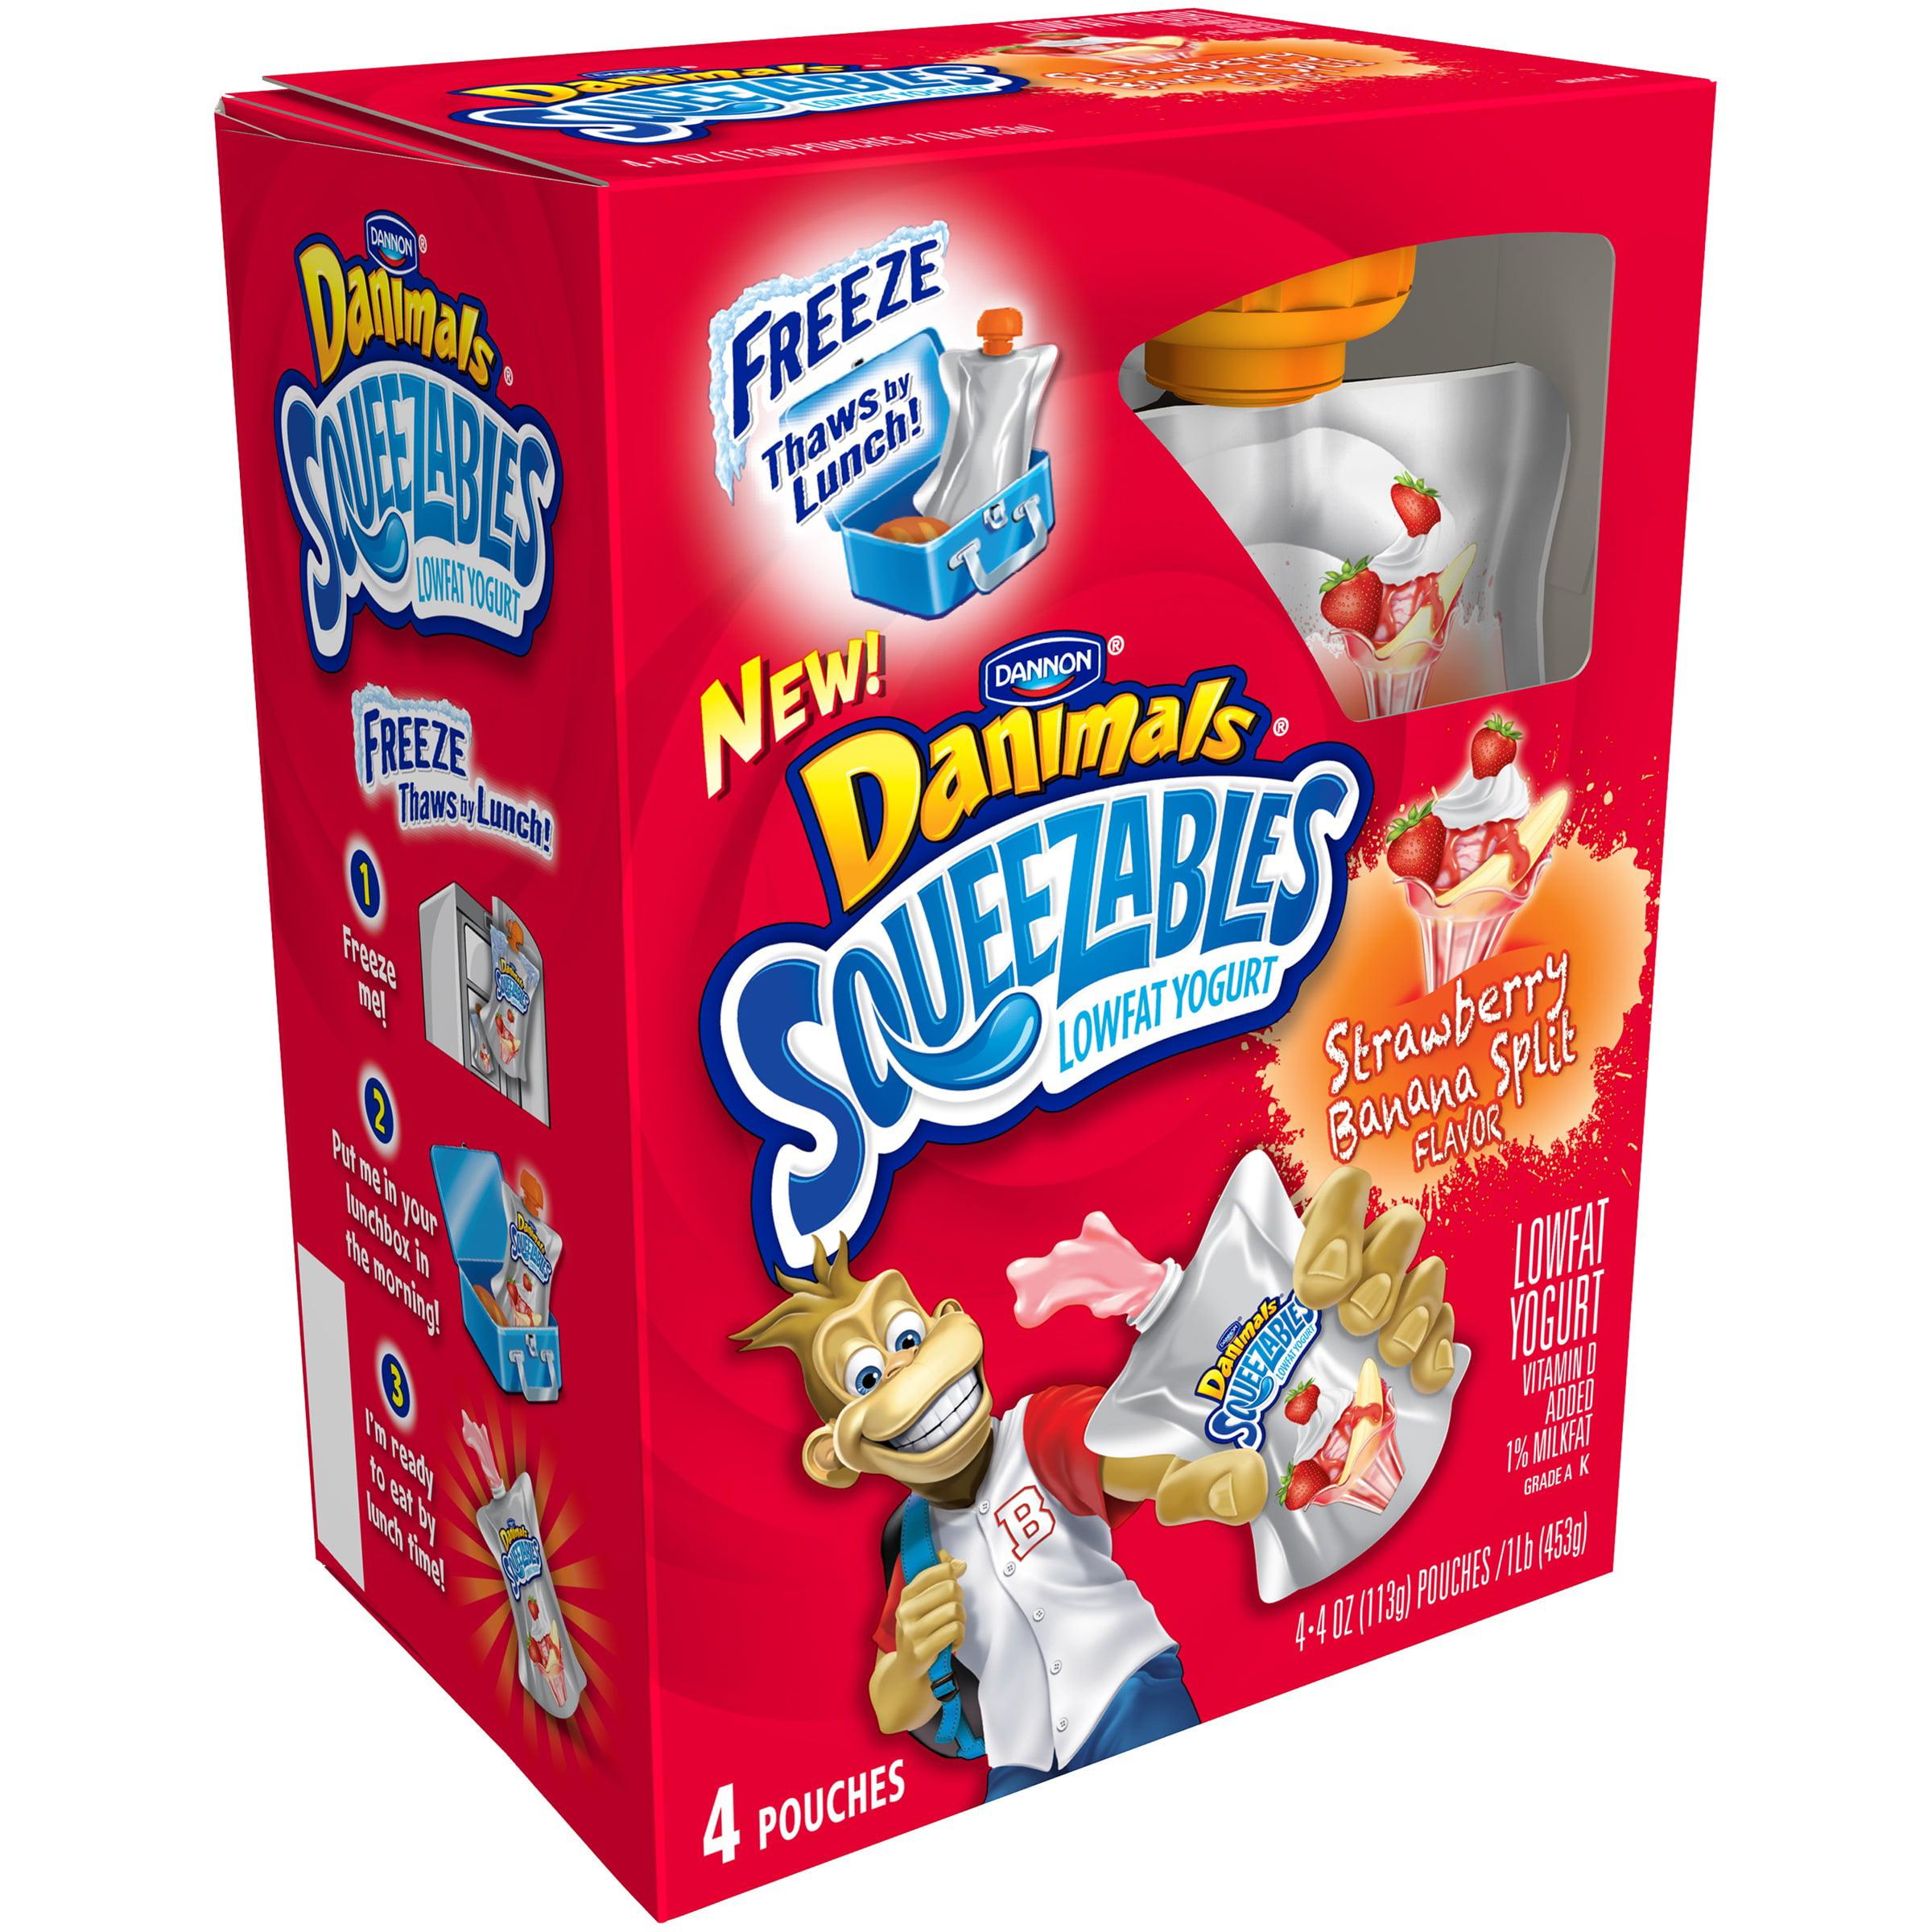 Dannon® Danimals® Lowfat Yogurt Pouches Swingin' Strawberry-Banana® 4oz 4 pack